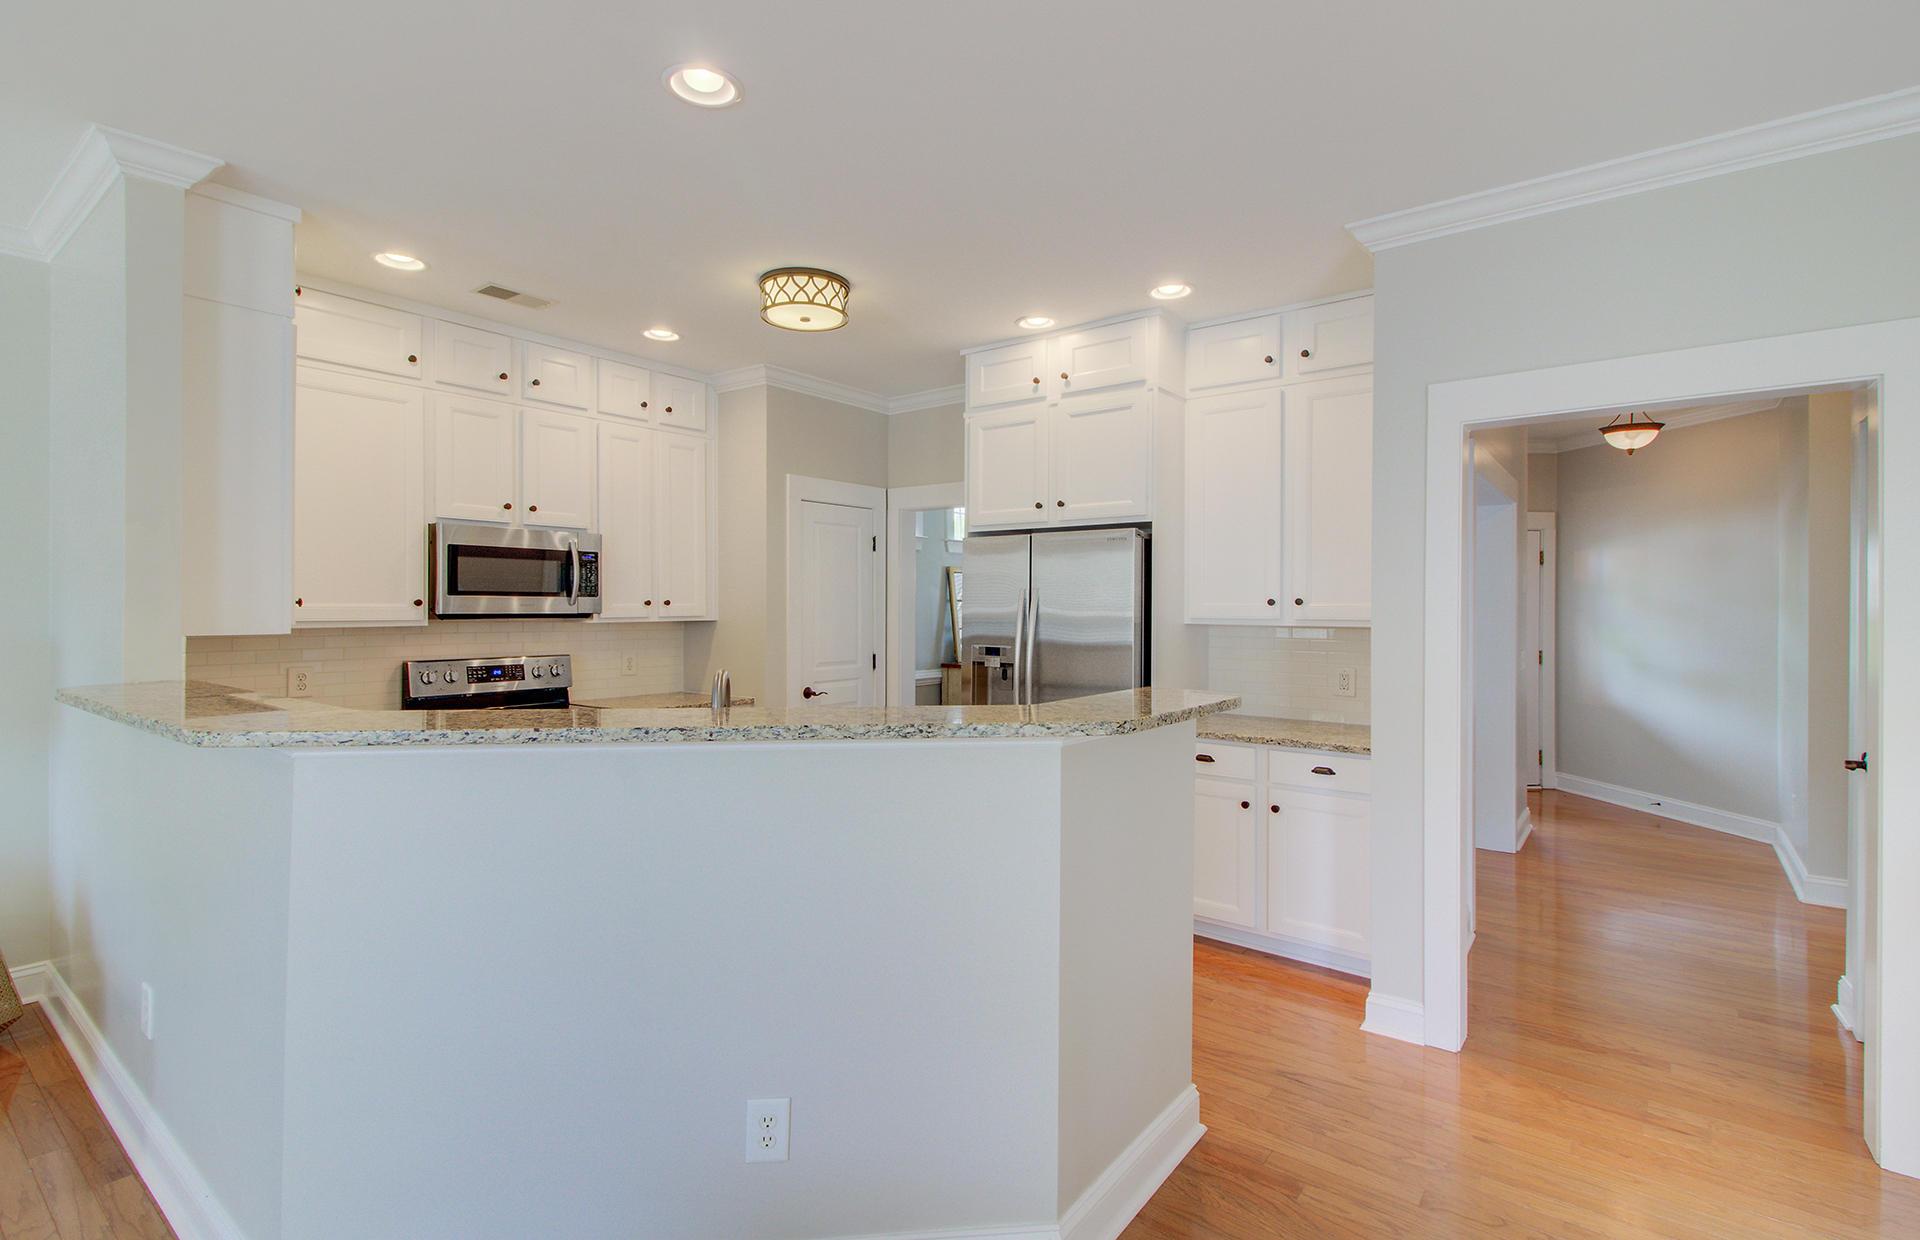 New Parrish Village Homes For Sale - 1109 Dawn View, Mount Pleasant, SC - 9